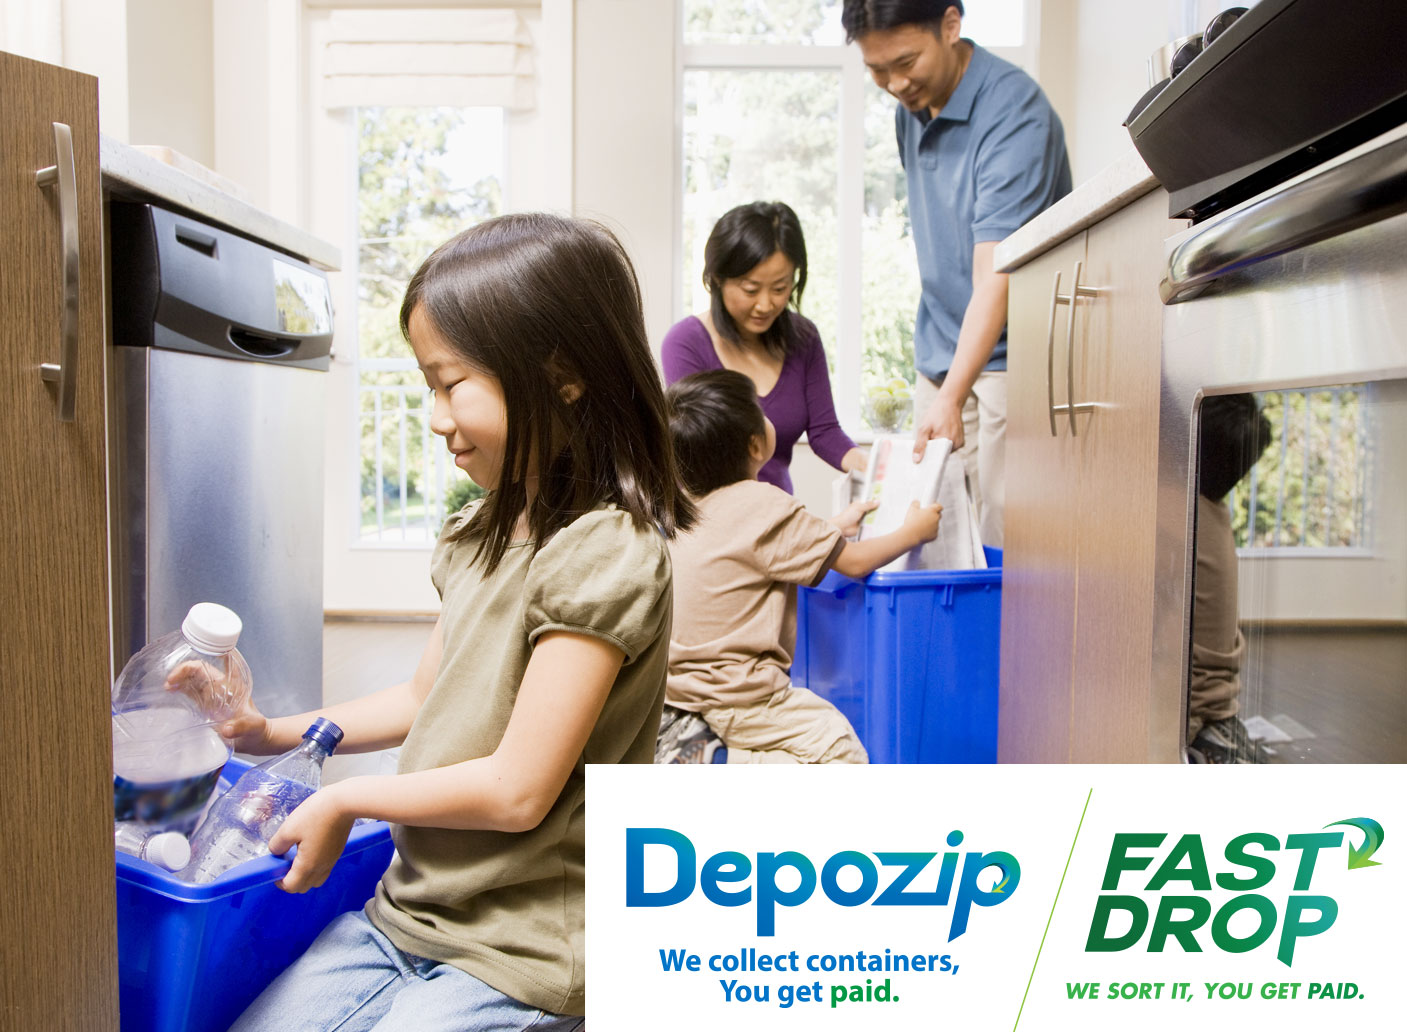 Depozip fast drop regional recycling